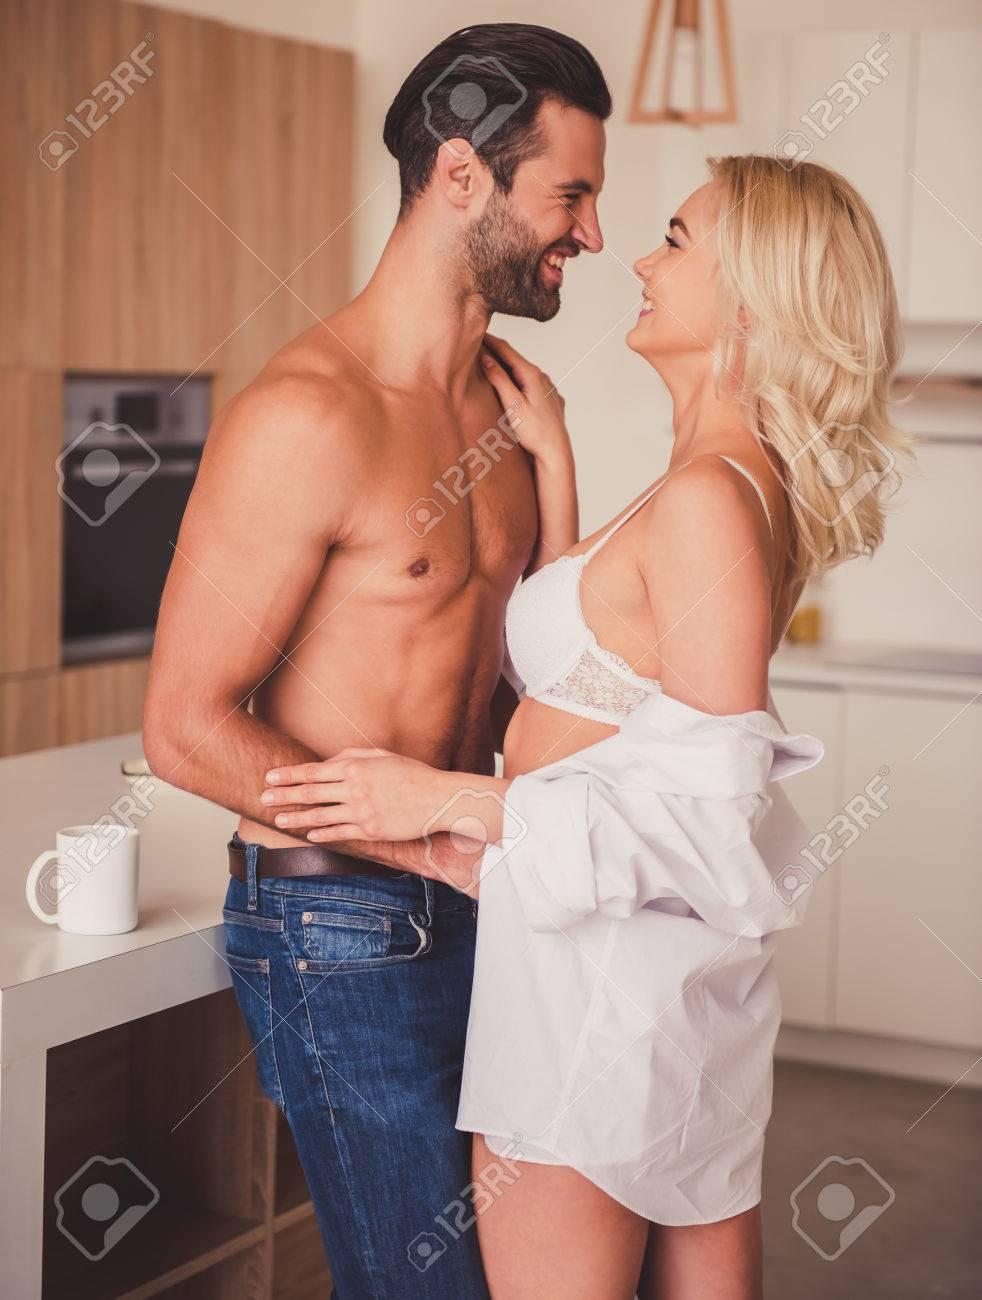 Happy Nude Couples